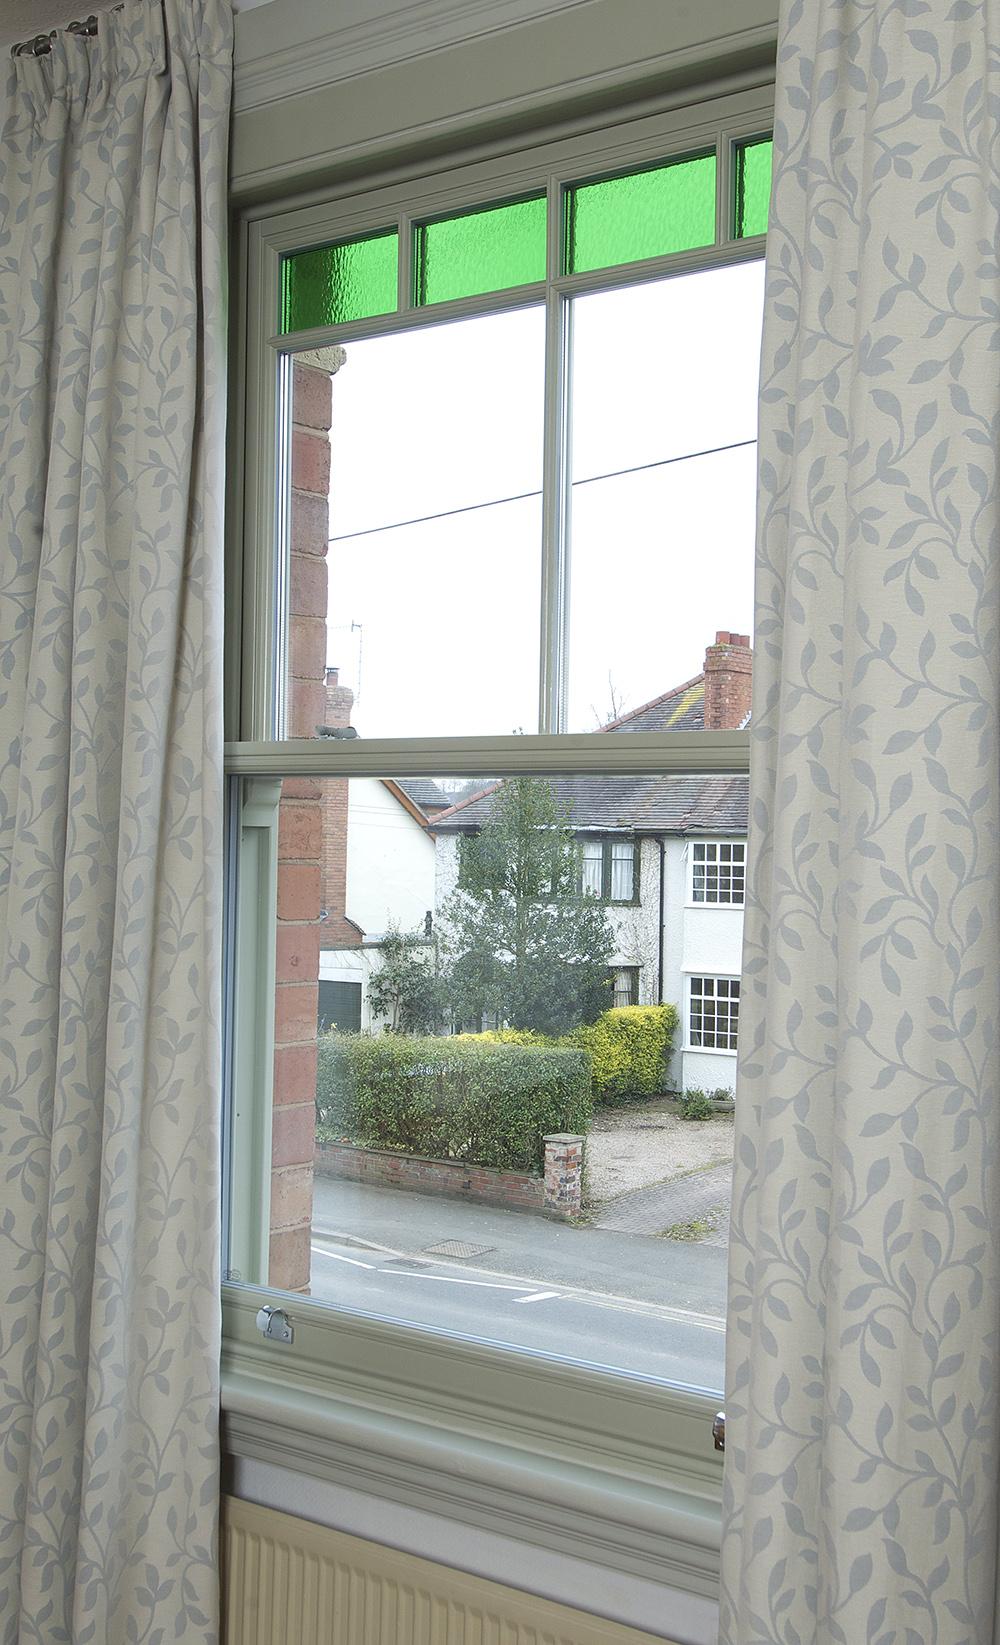 Bewdley sash window green glass detail